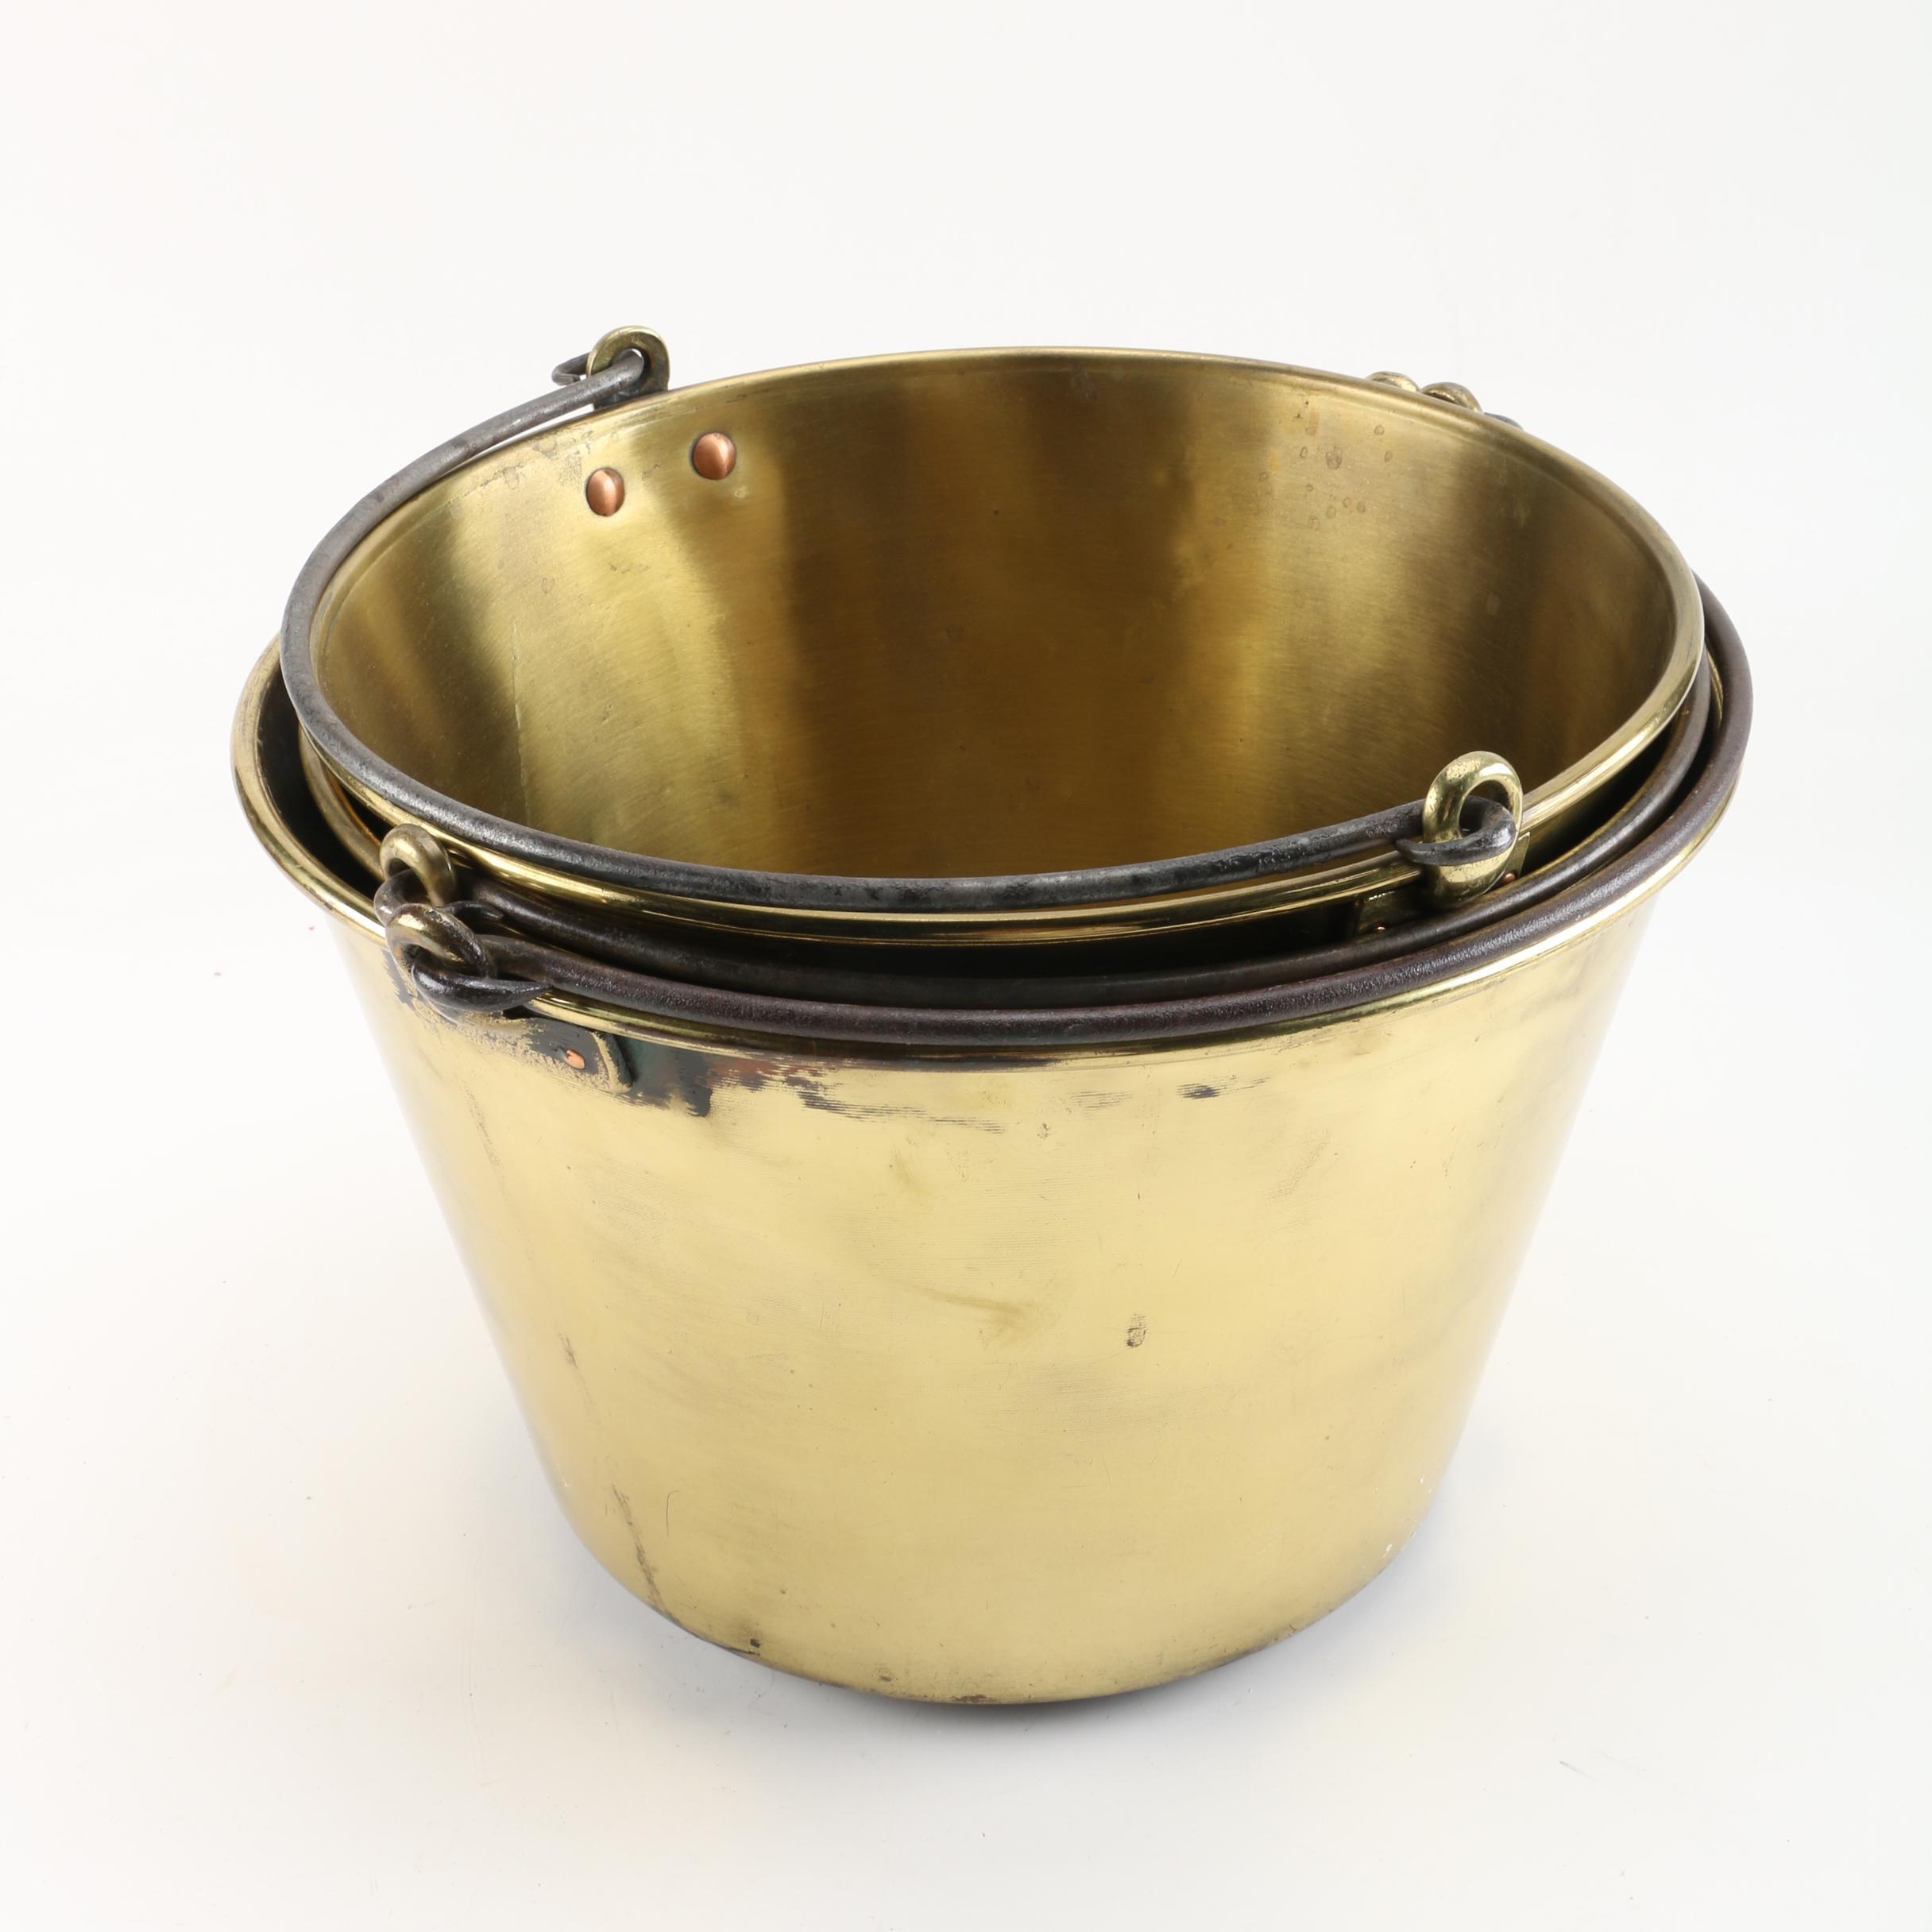 American Brass Kettle Co. Spun Brass Pails